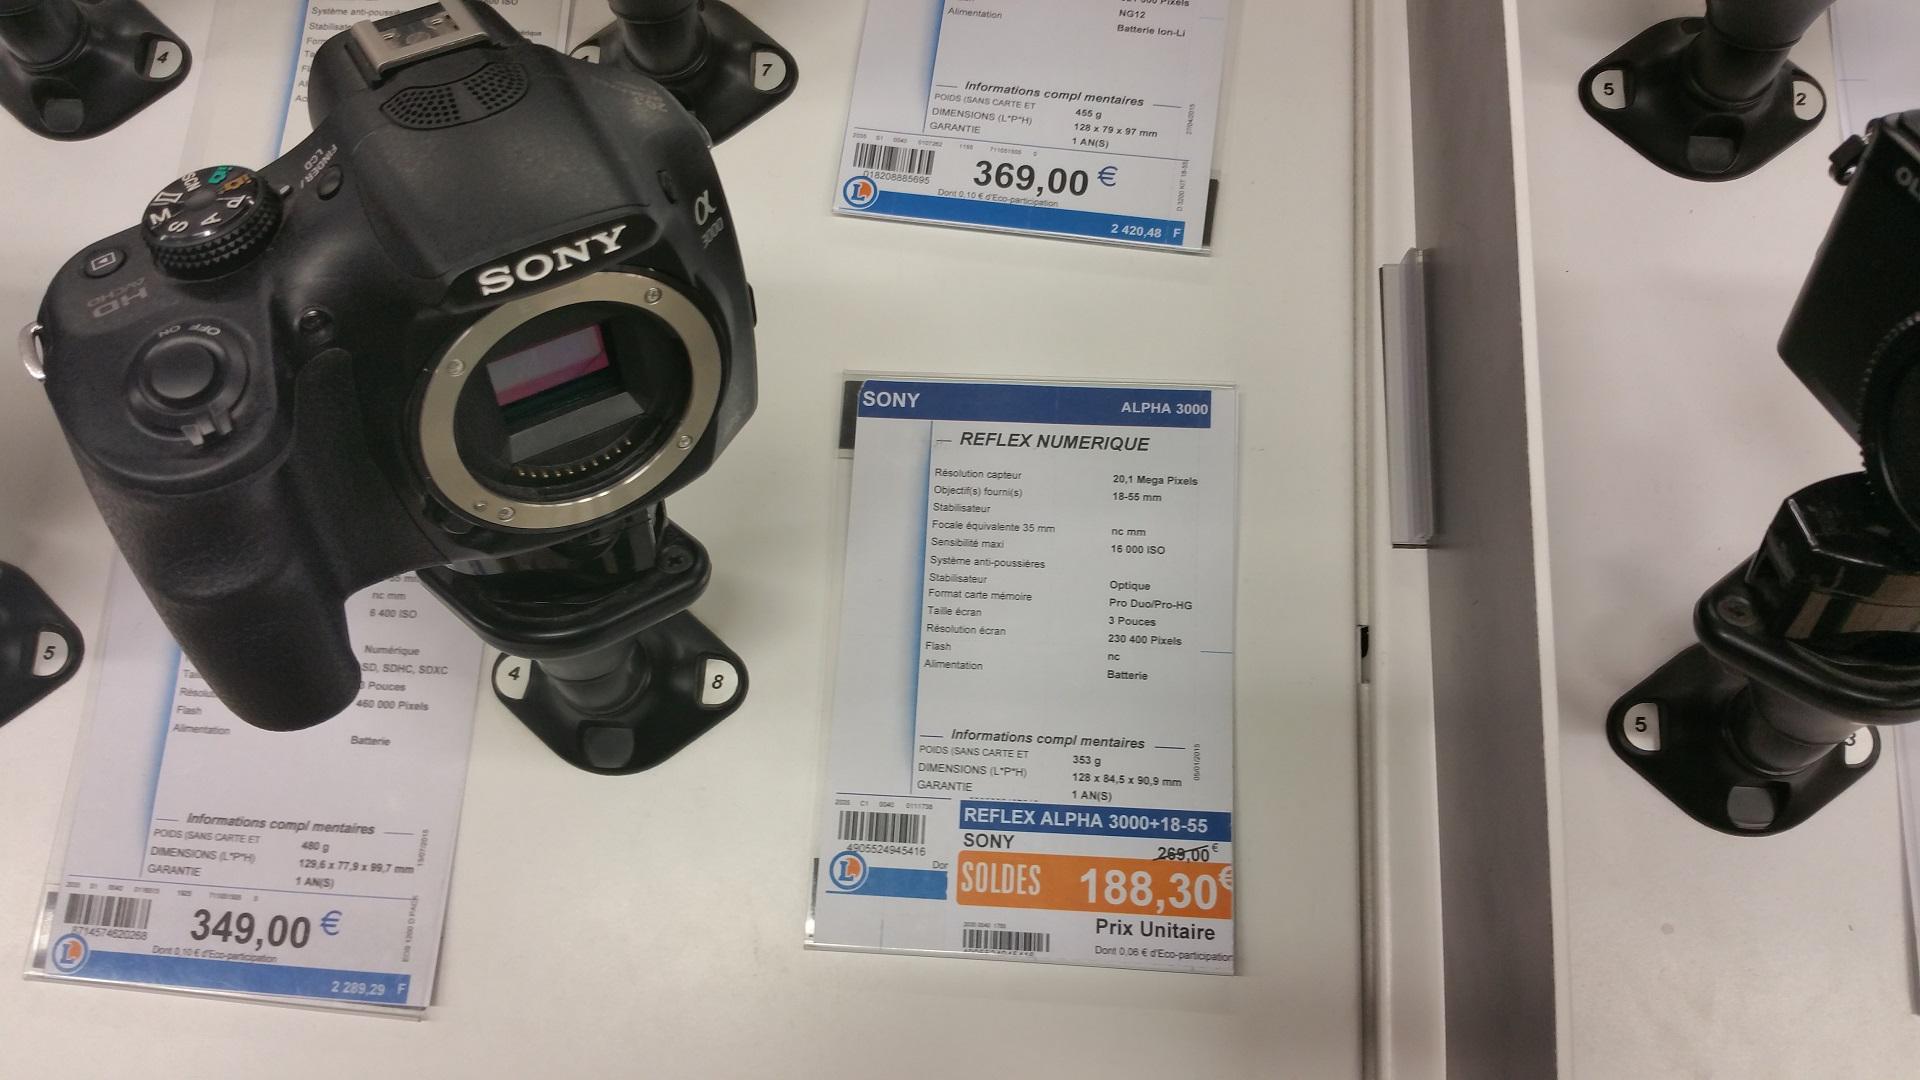 Appareil Photo Hybride Nikon S1 + 11-27.5mm à 118.3€ et Reflex Sony Alpha 3000 + 18-55mm